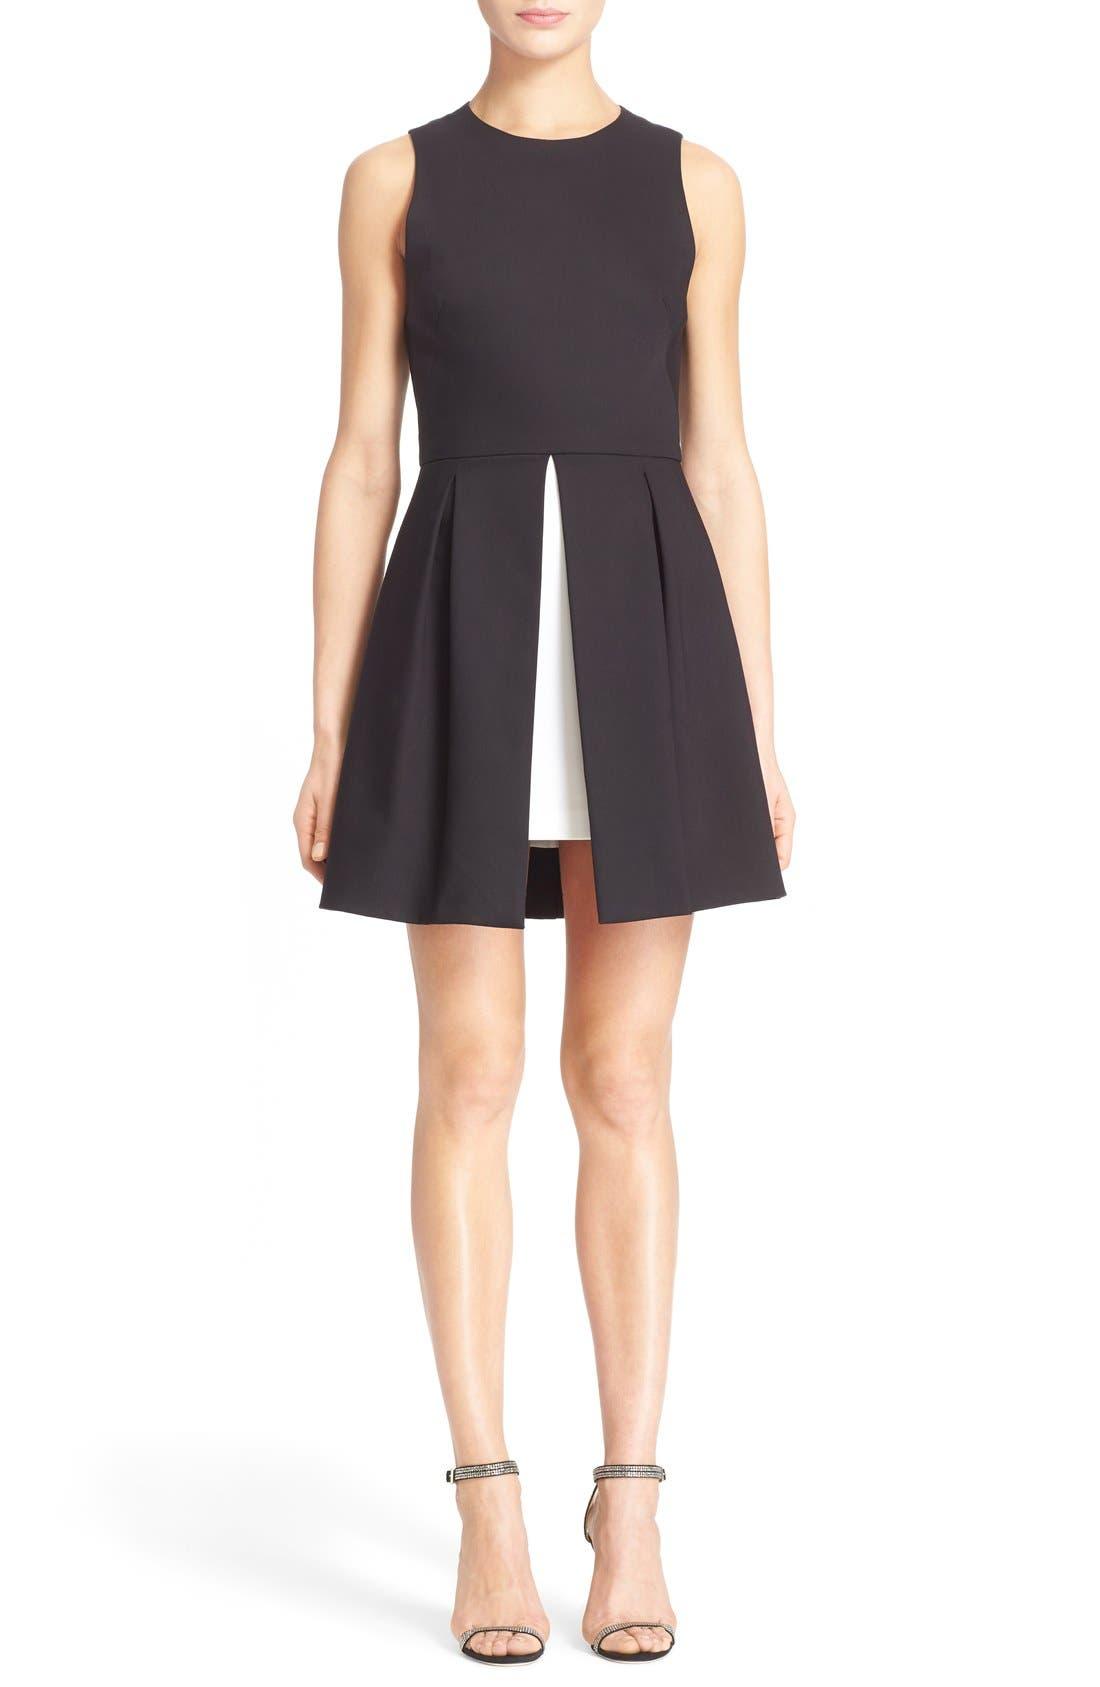 Alice + Olivia 'Bria' Peplum Fit & Flare Dress